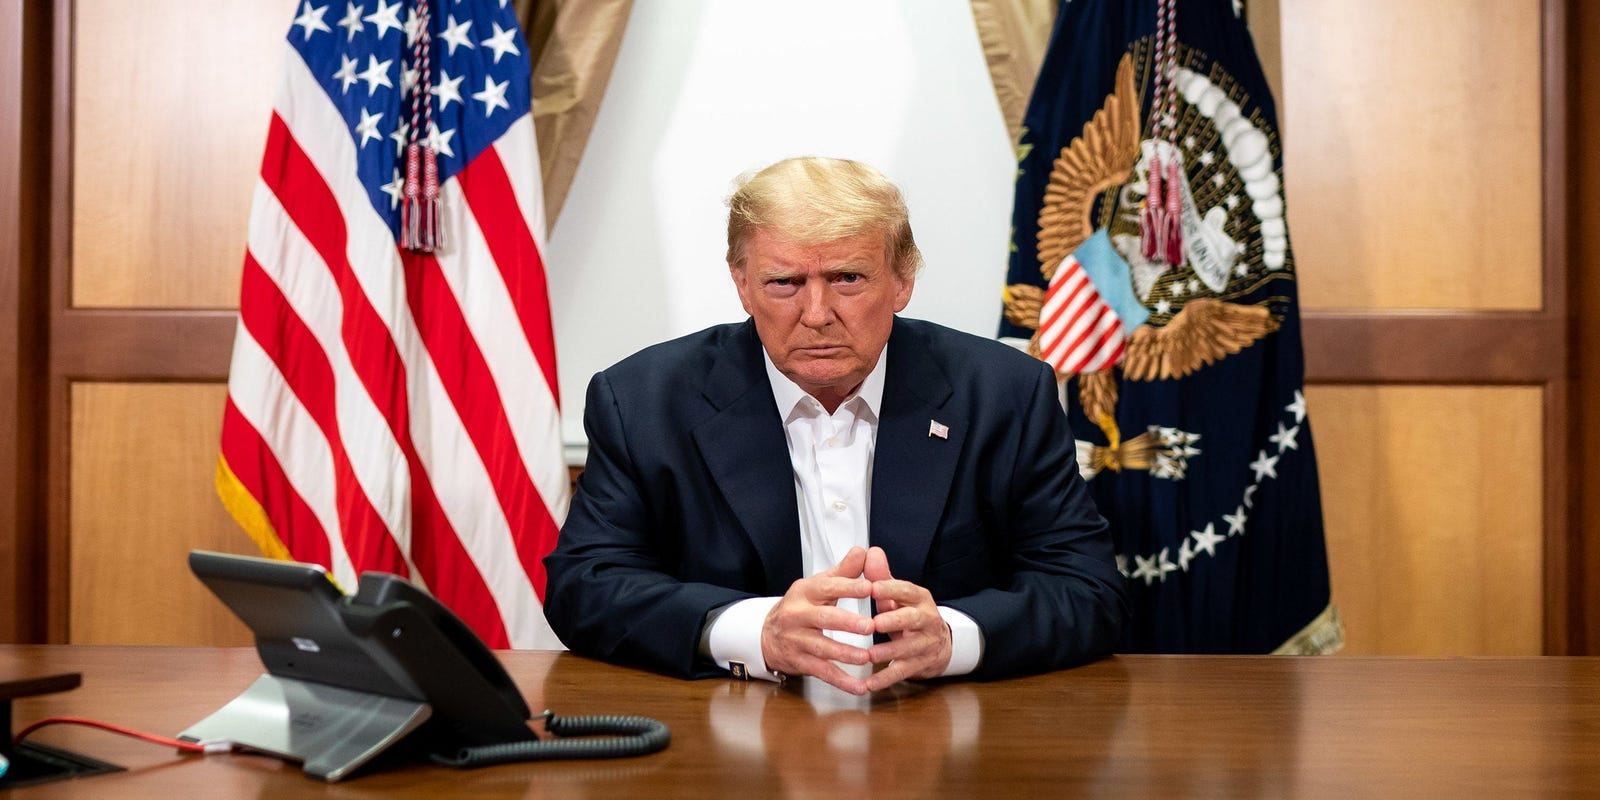 Fact check: Fake Trump quote about battling coronavirus, his body